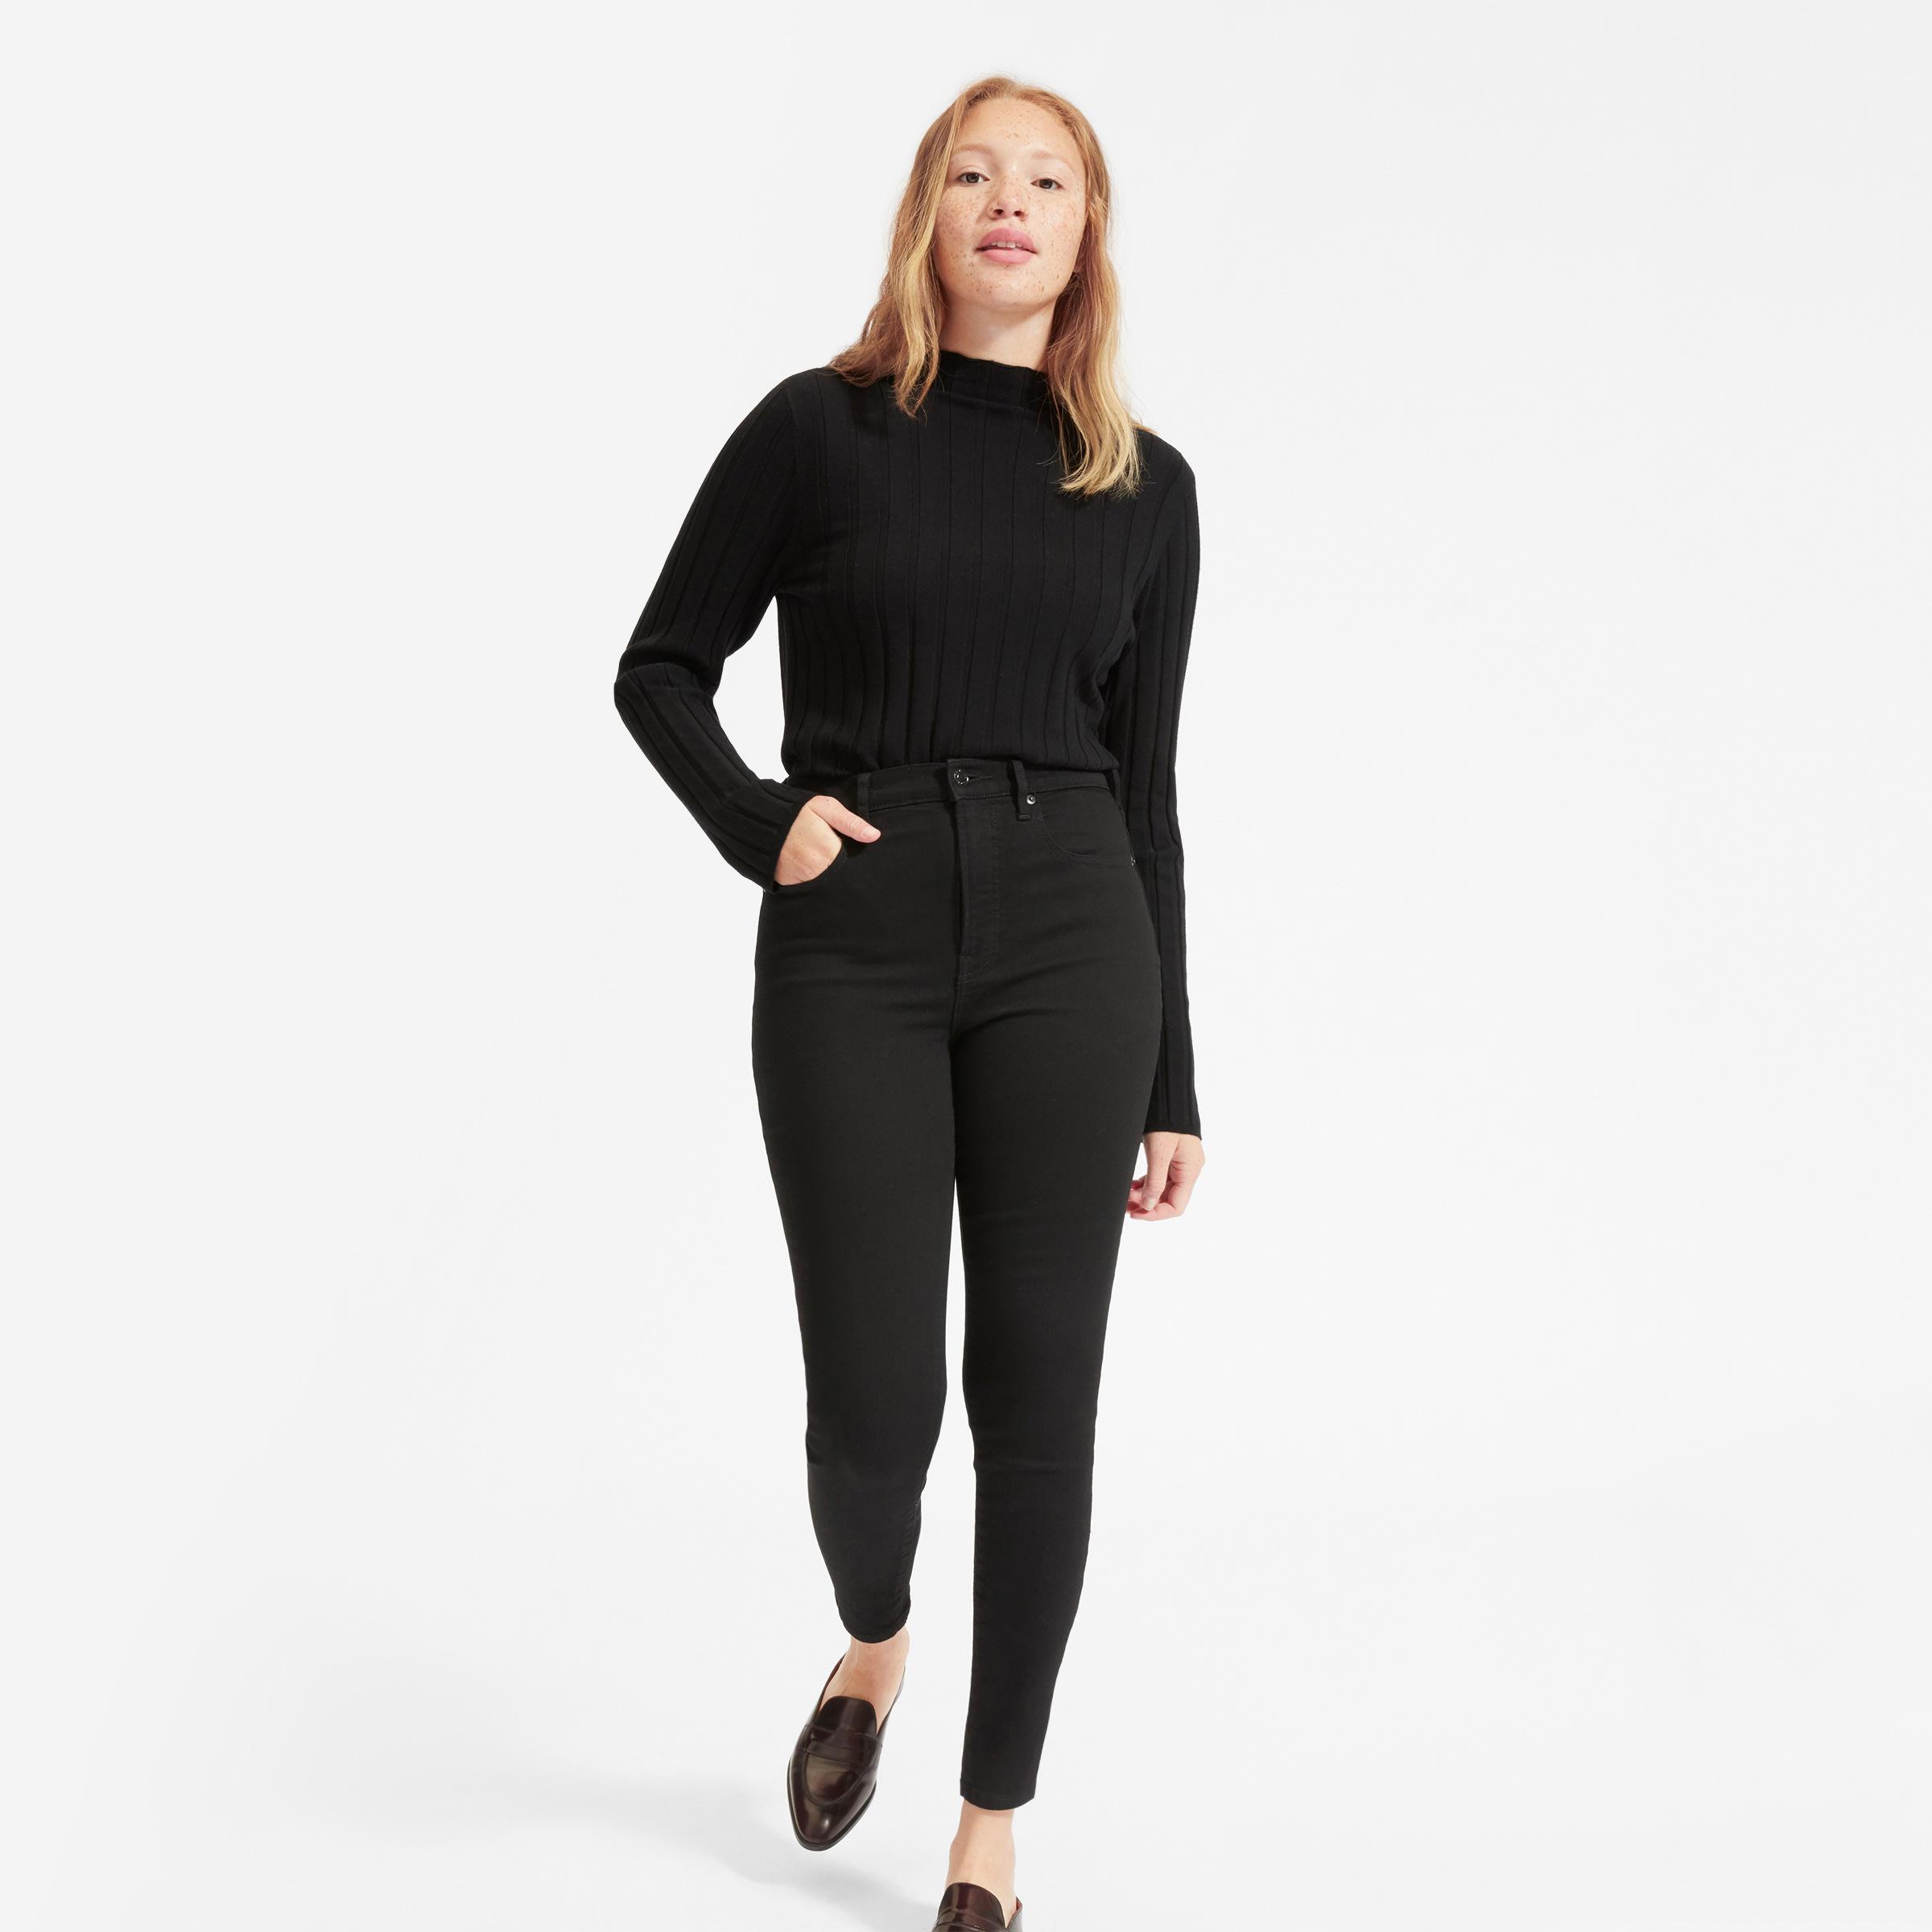 204ec2af446a High Rise & Skinny Jeans for Women | Everlane